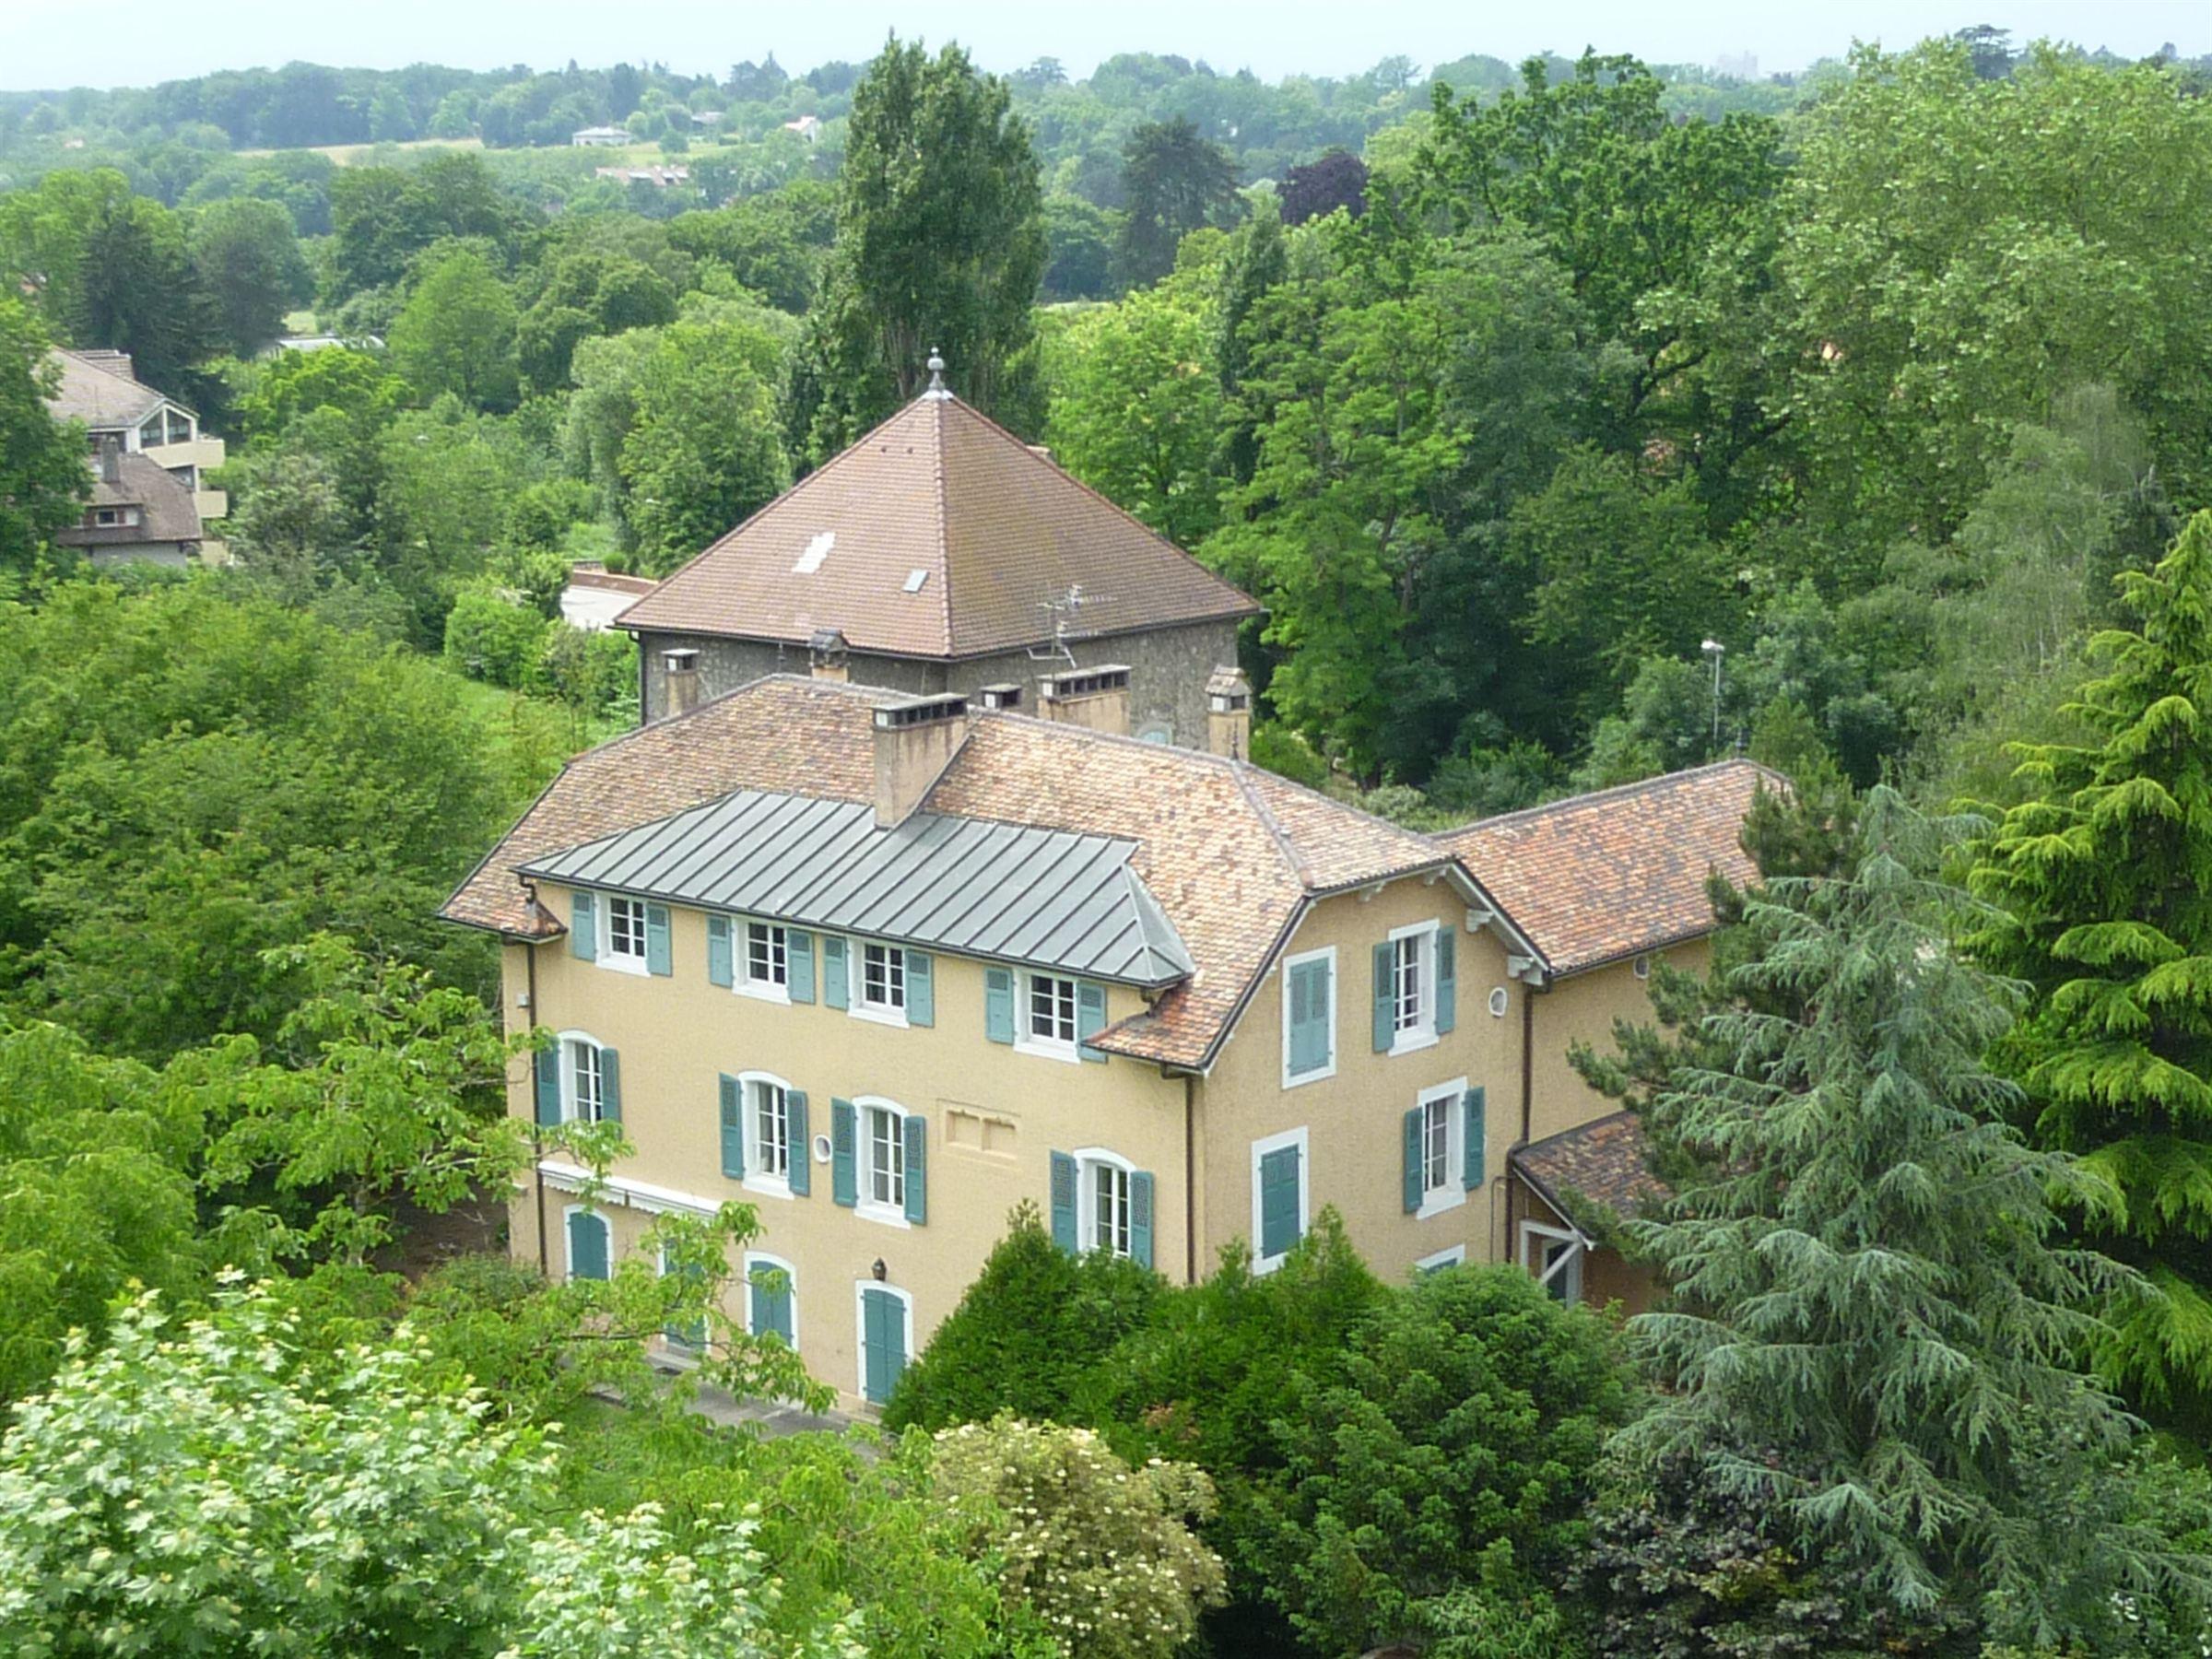 Apartment for Sale at flat in a castle near Geneva Gaillard, Rhone-Alpes, 74240 France